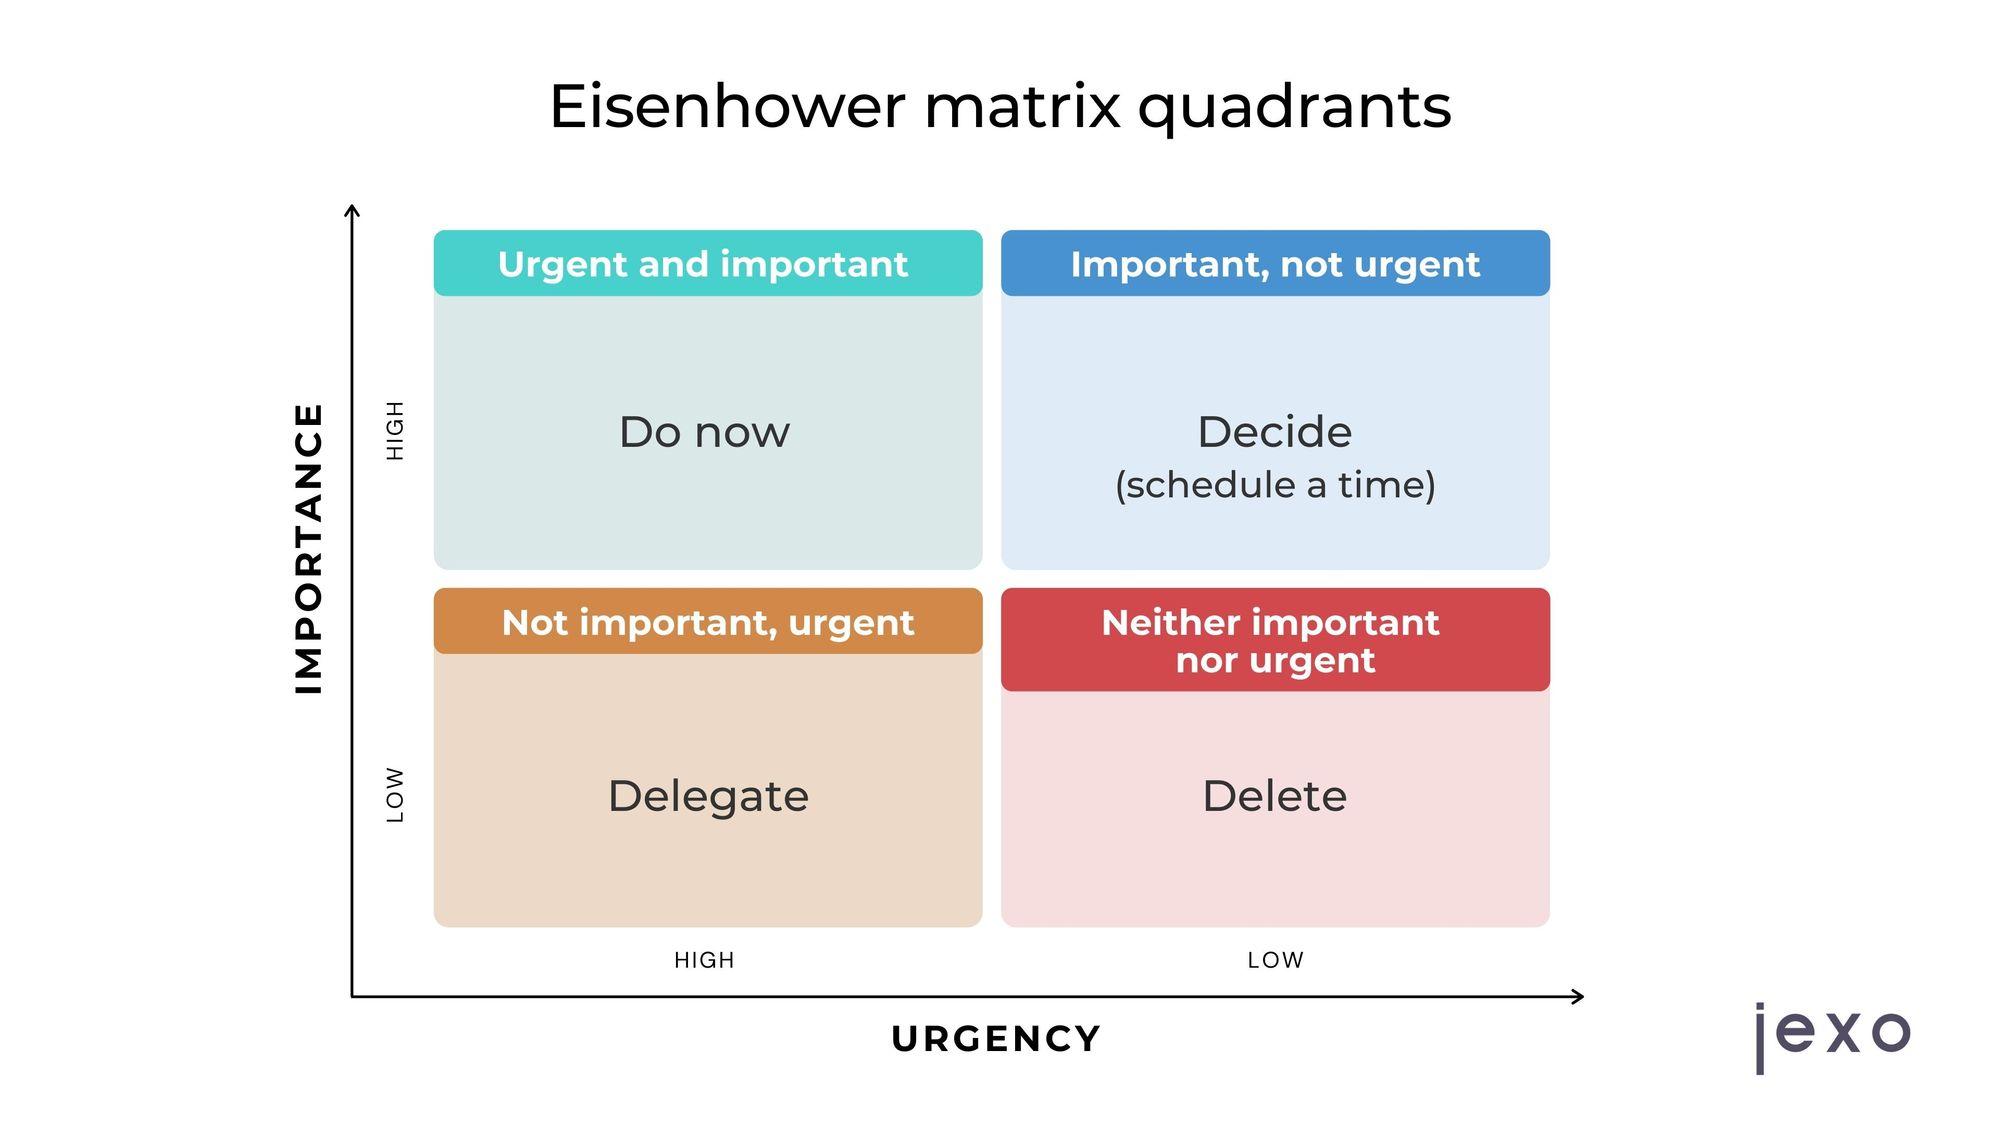 Eisenhower Matrix has four quadrants - importance vs. urgency